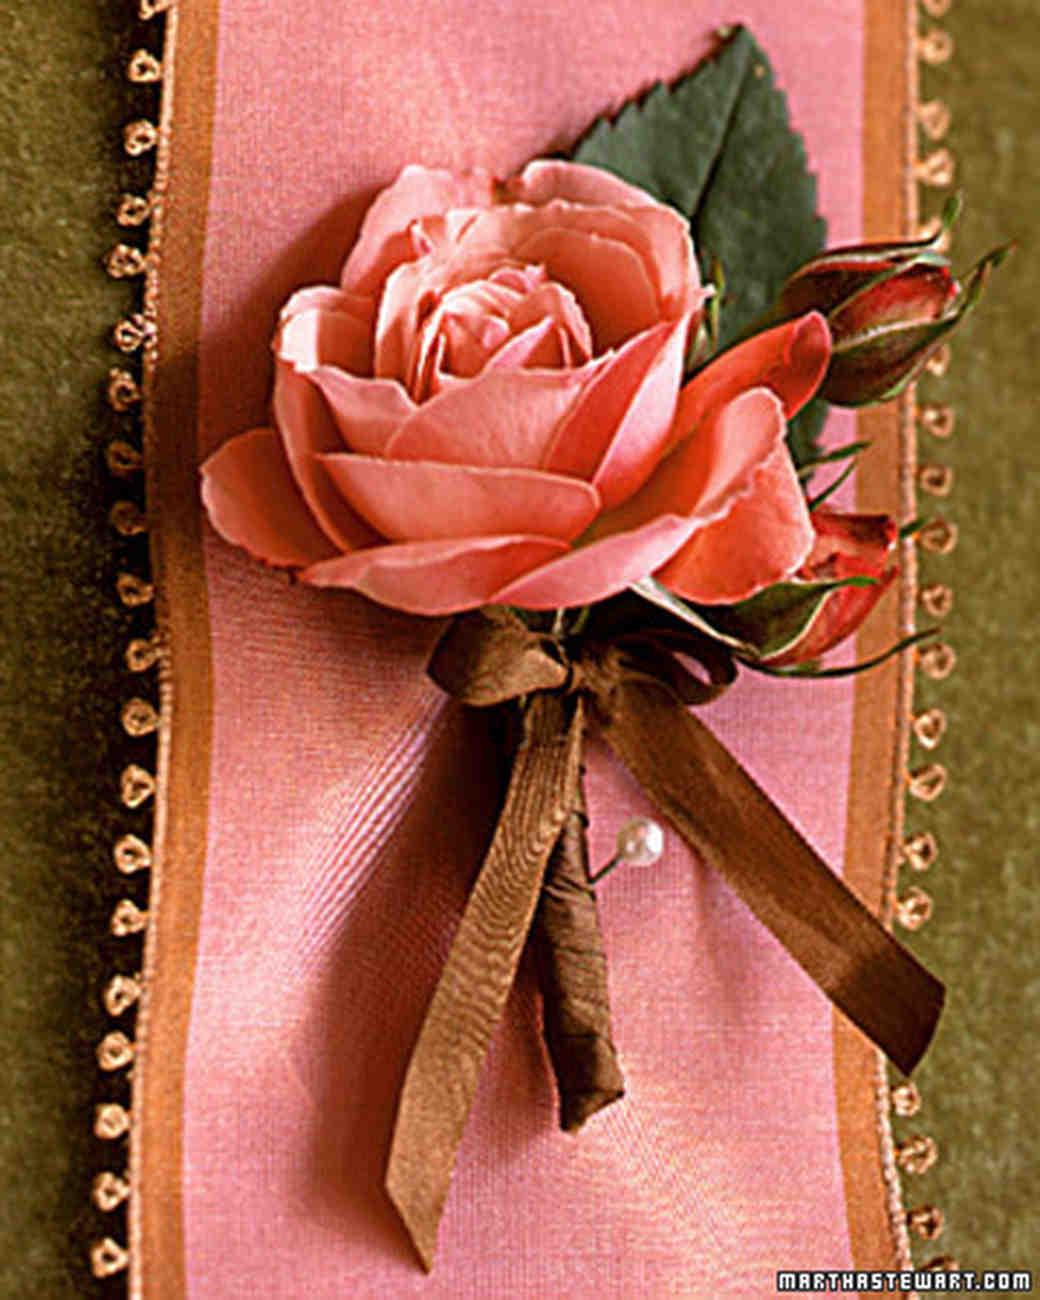 rosebouquets05_spr99.jpg